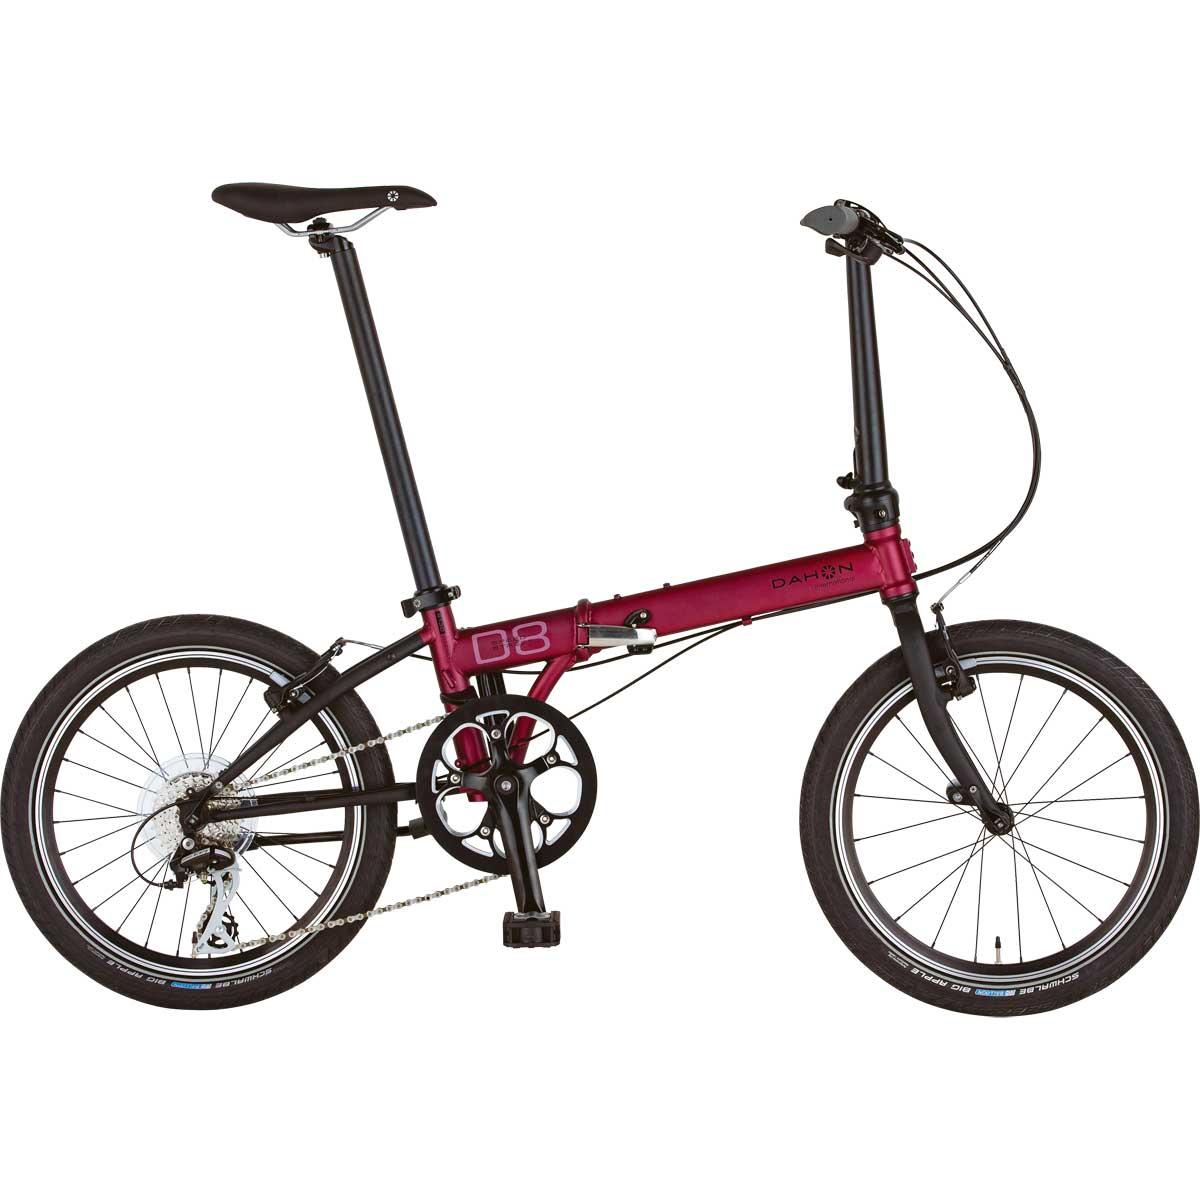 DAHON/ダホン Speed D8 Street スピード D8 ストリートダークワイン(9012) 折りたたみ自転車 自転車本体